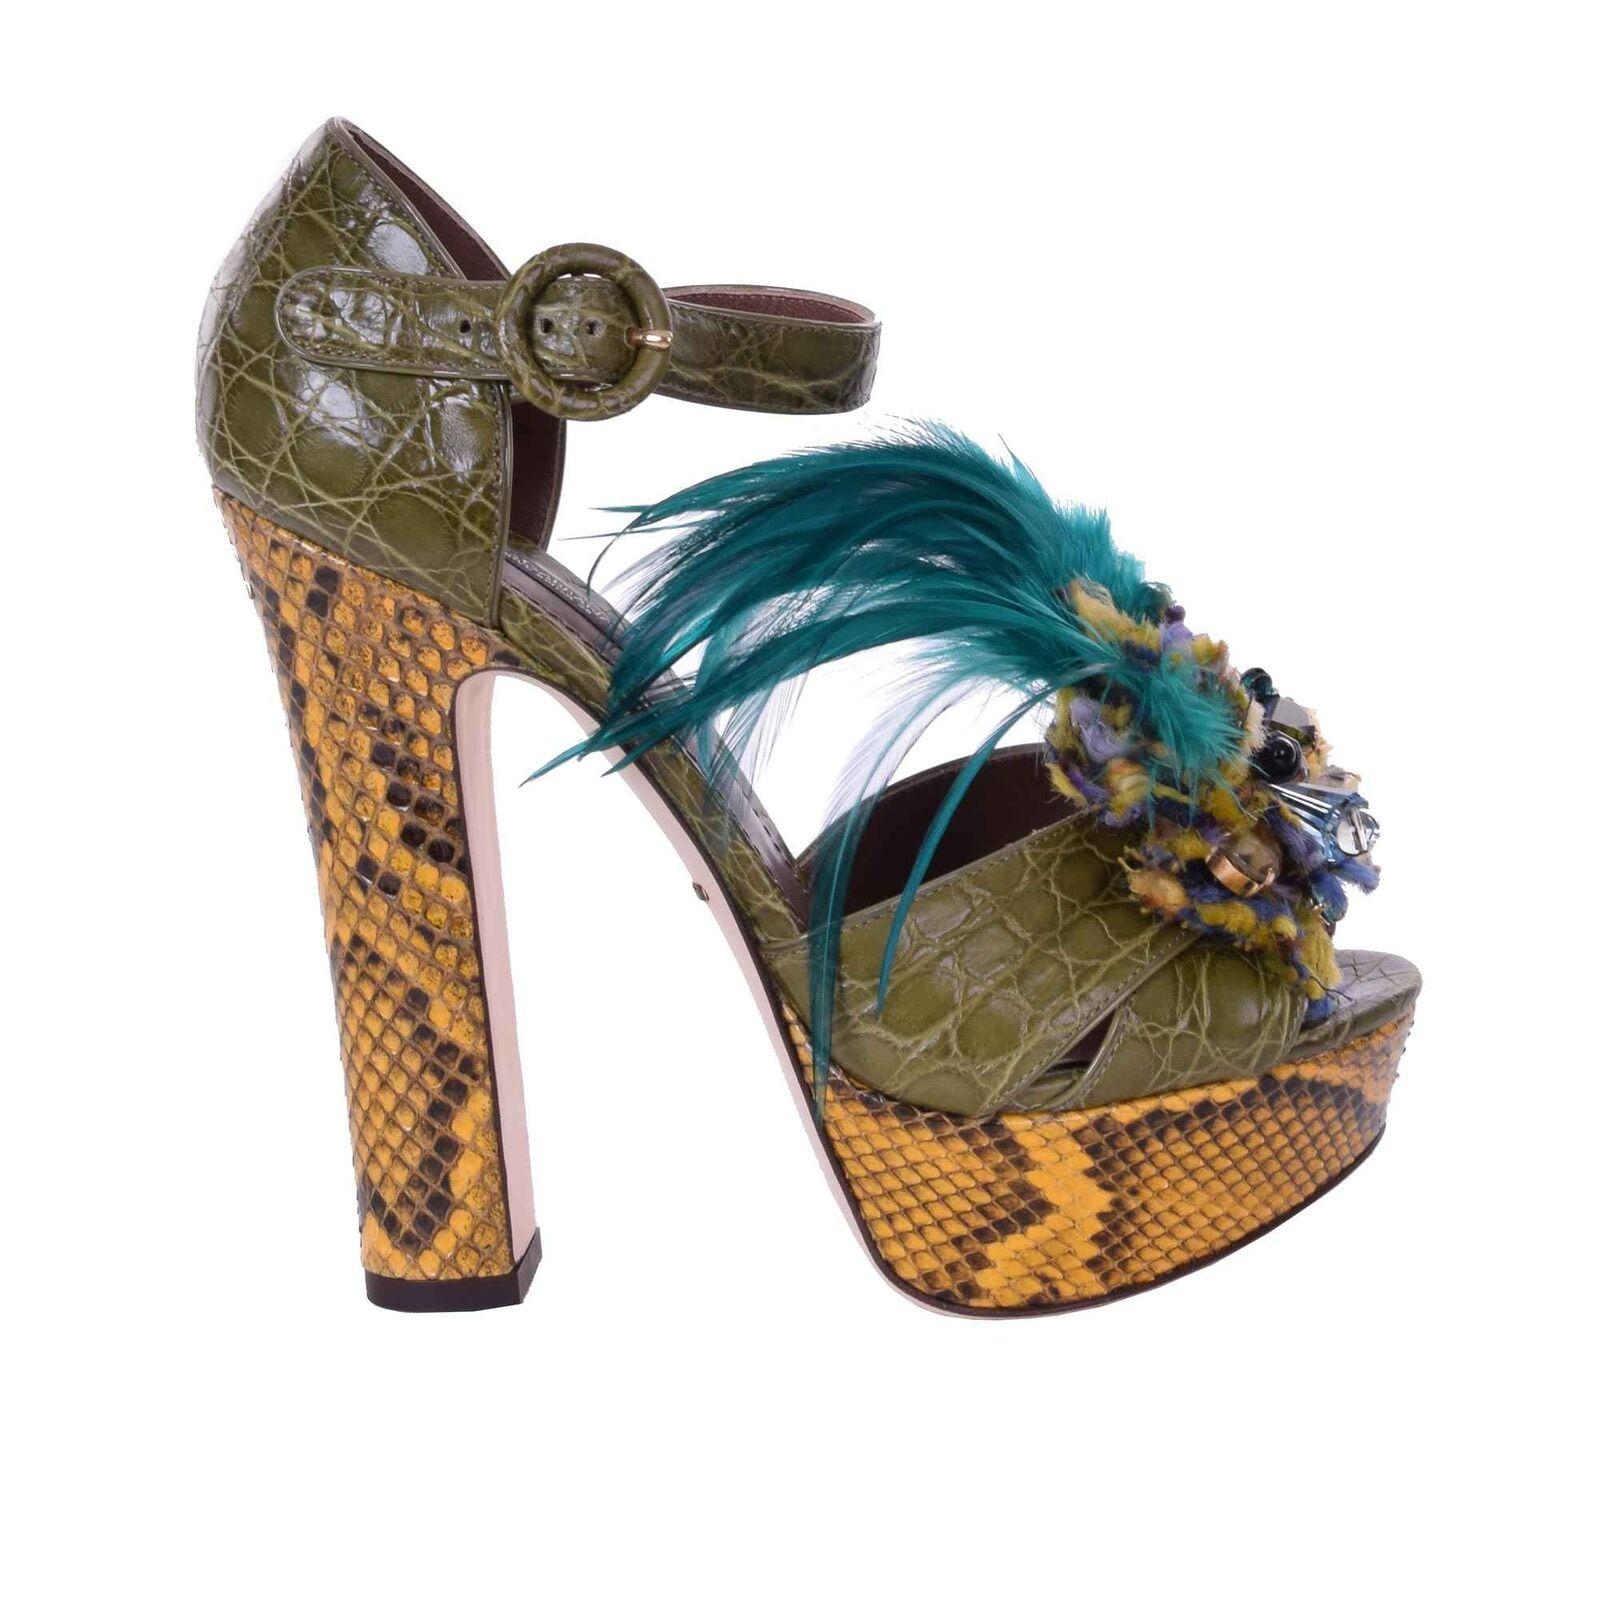 Dolce & Gabbana cocodrilo plataforma de salón sandalias, zapatos broche verde 06153